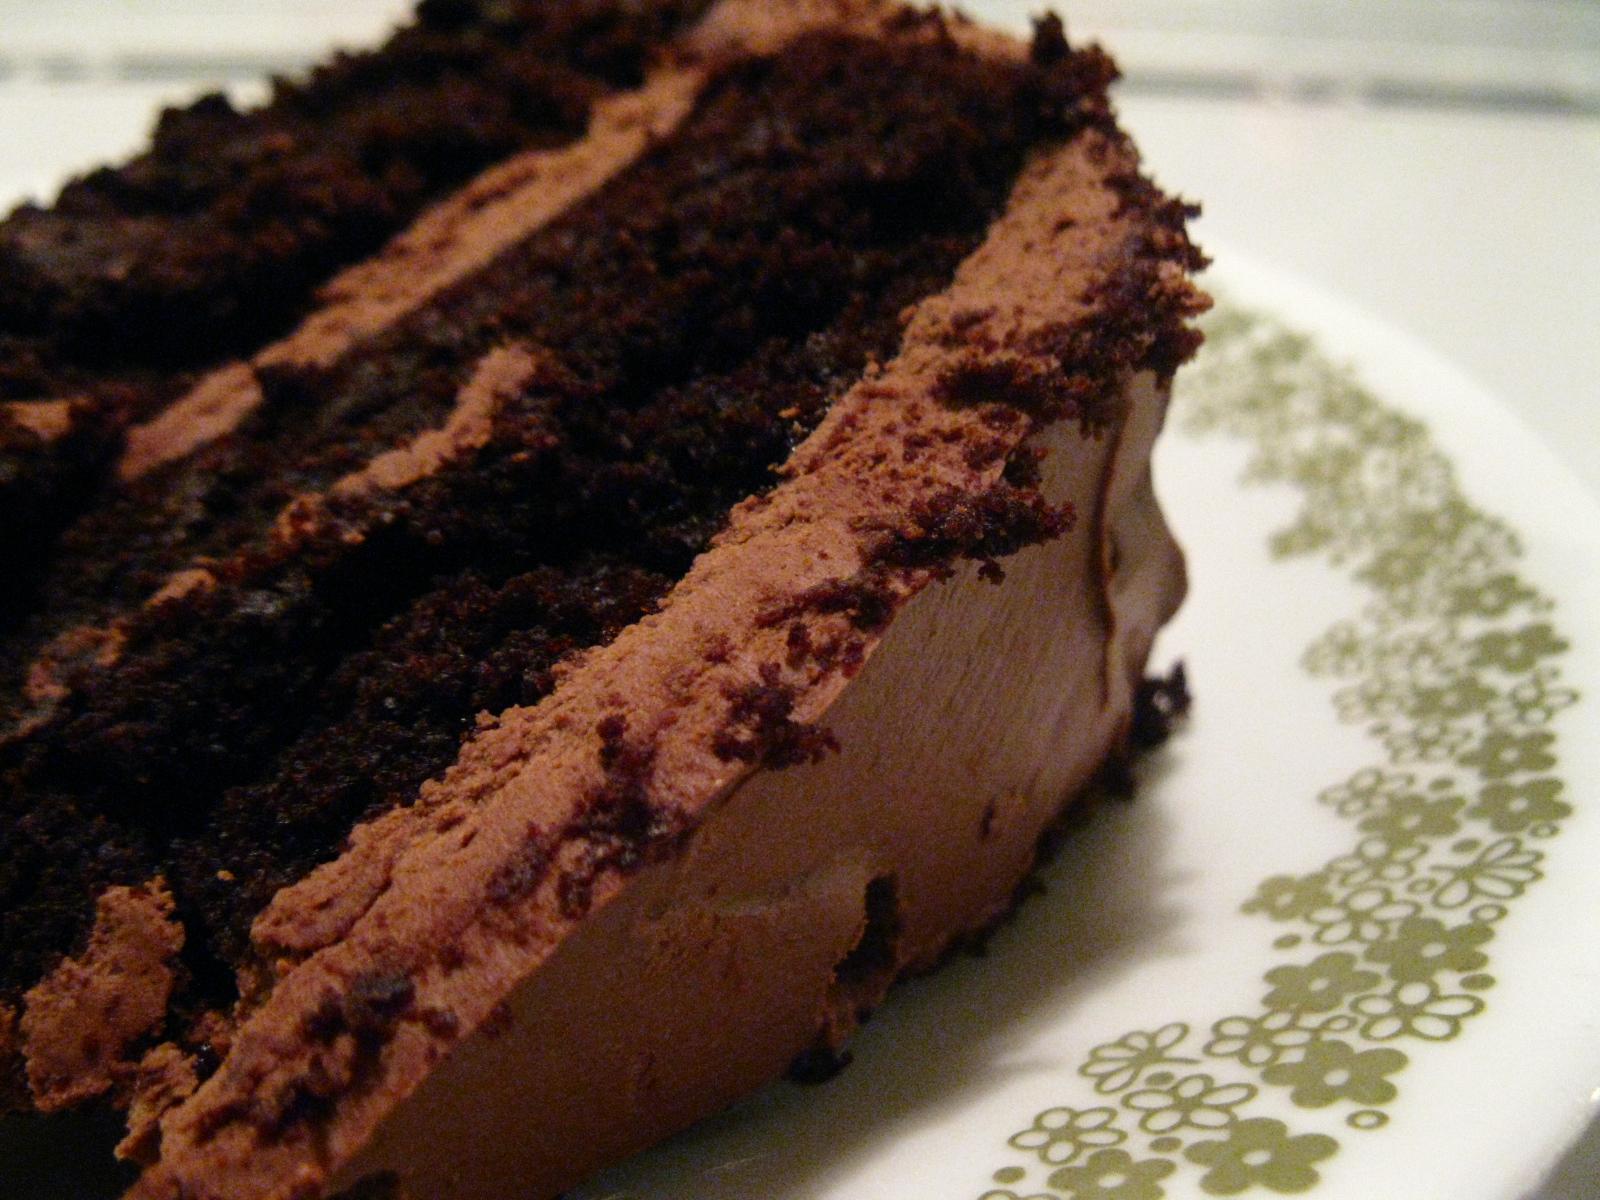 Leslie Cerier S Dark Chocolate Cake Coombs Family Farms